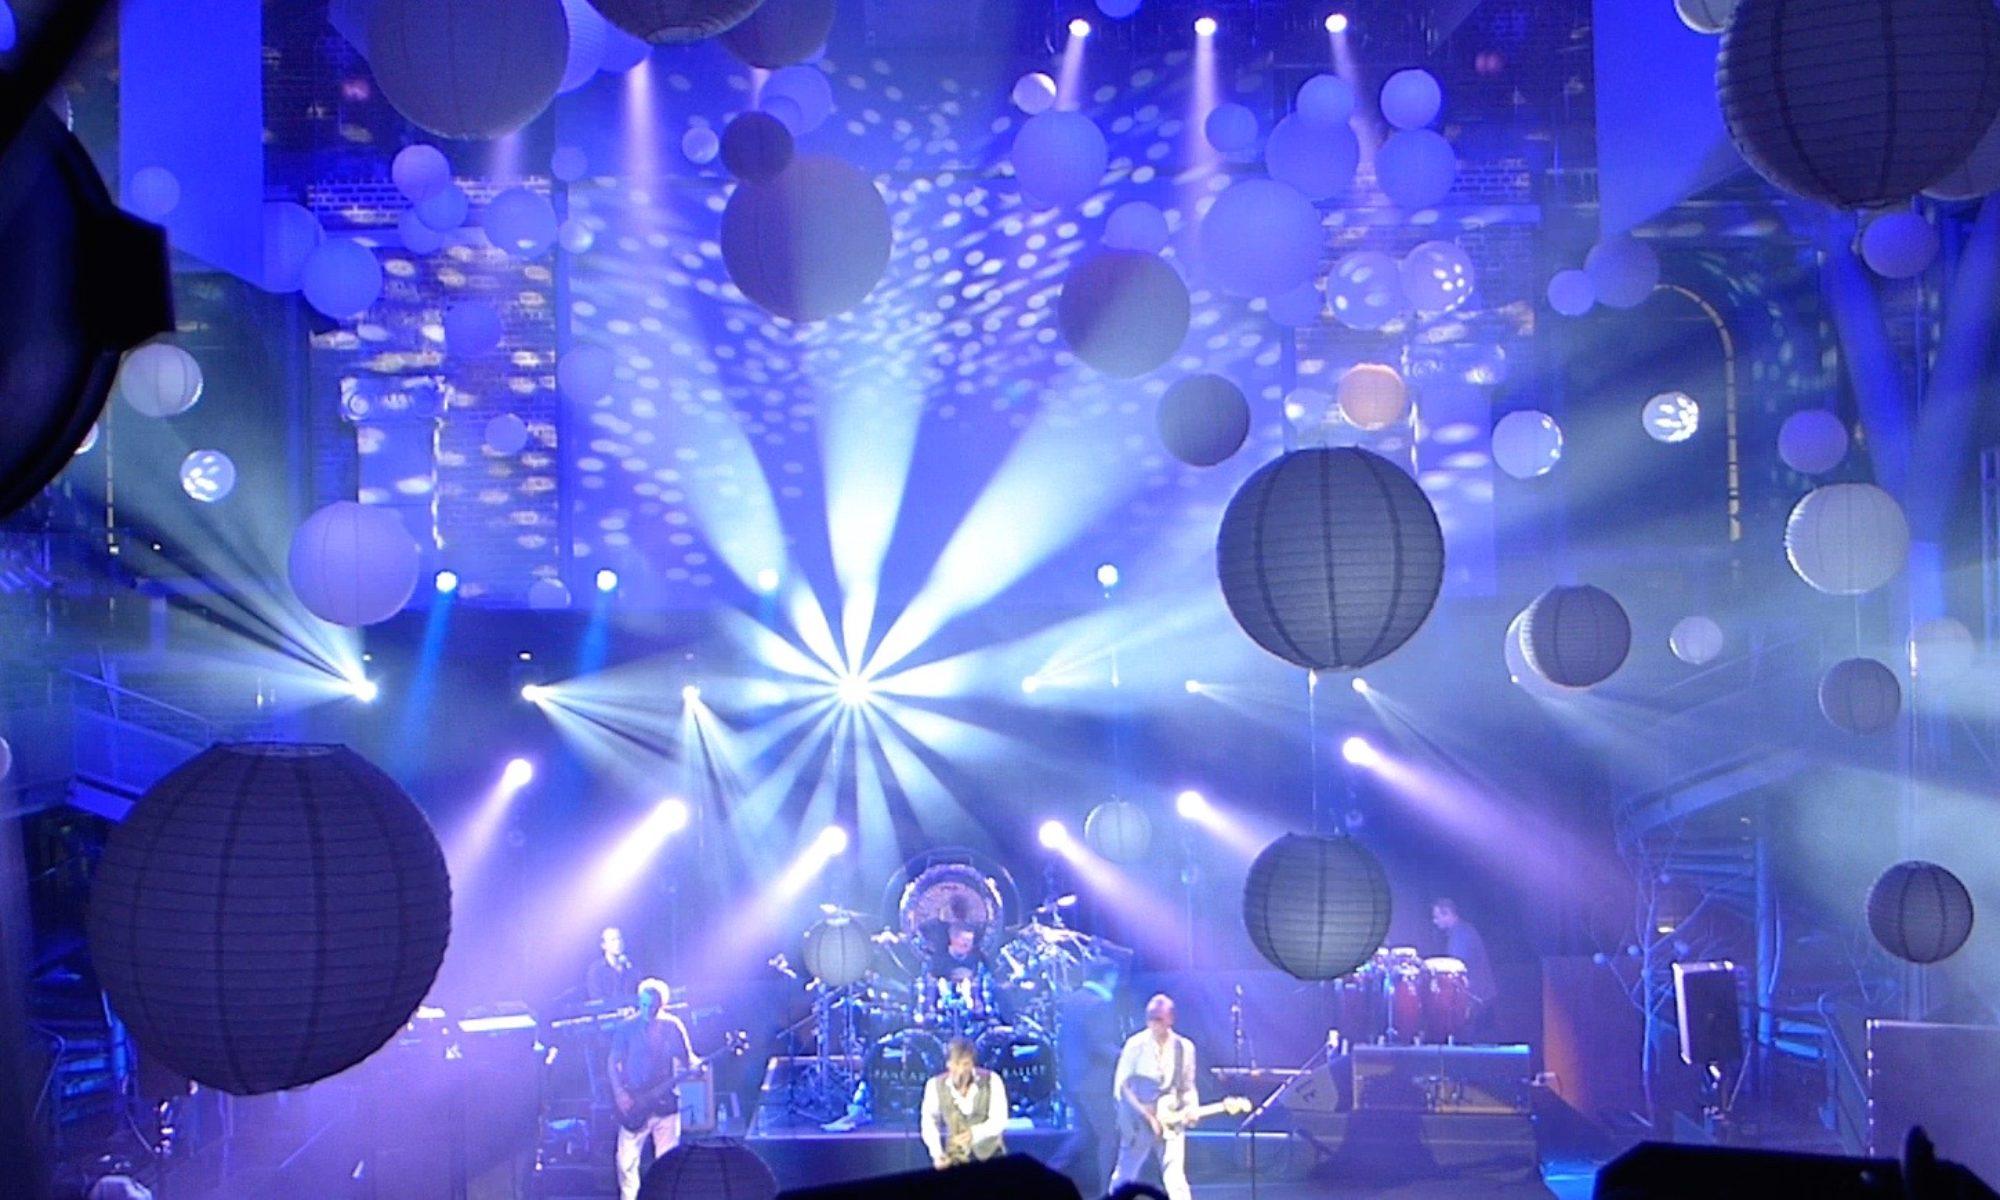 Zigzag Stage & Event Lighting